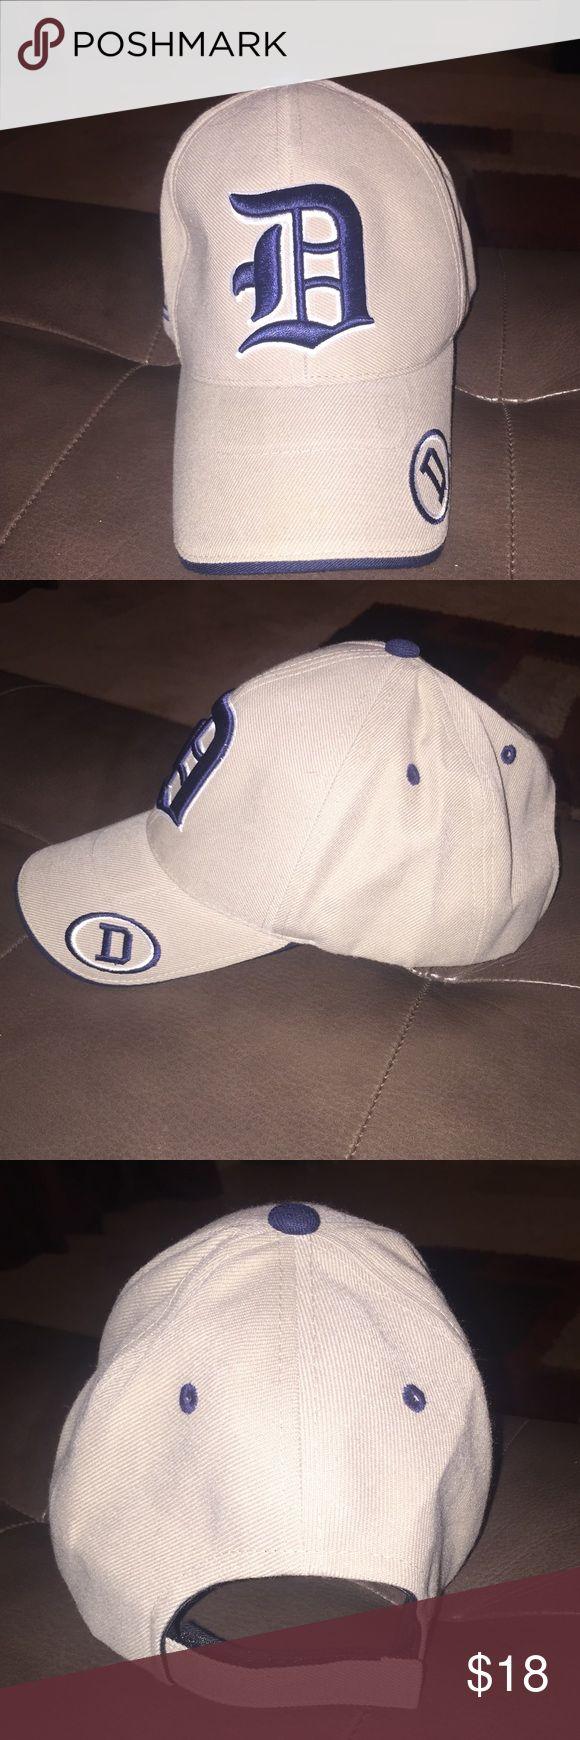 MLB Detroit Tigers Hat It has a velcro back closure. Bits khaki in color. Accessories Hats